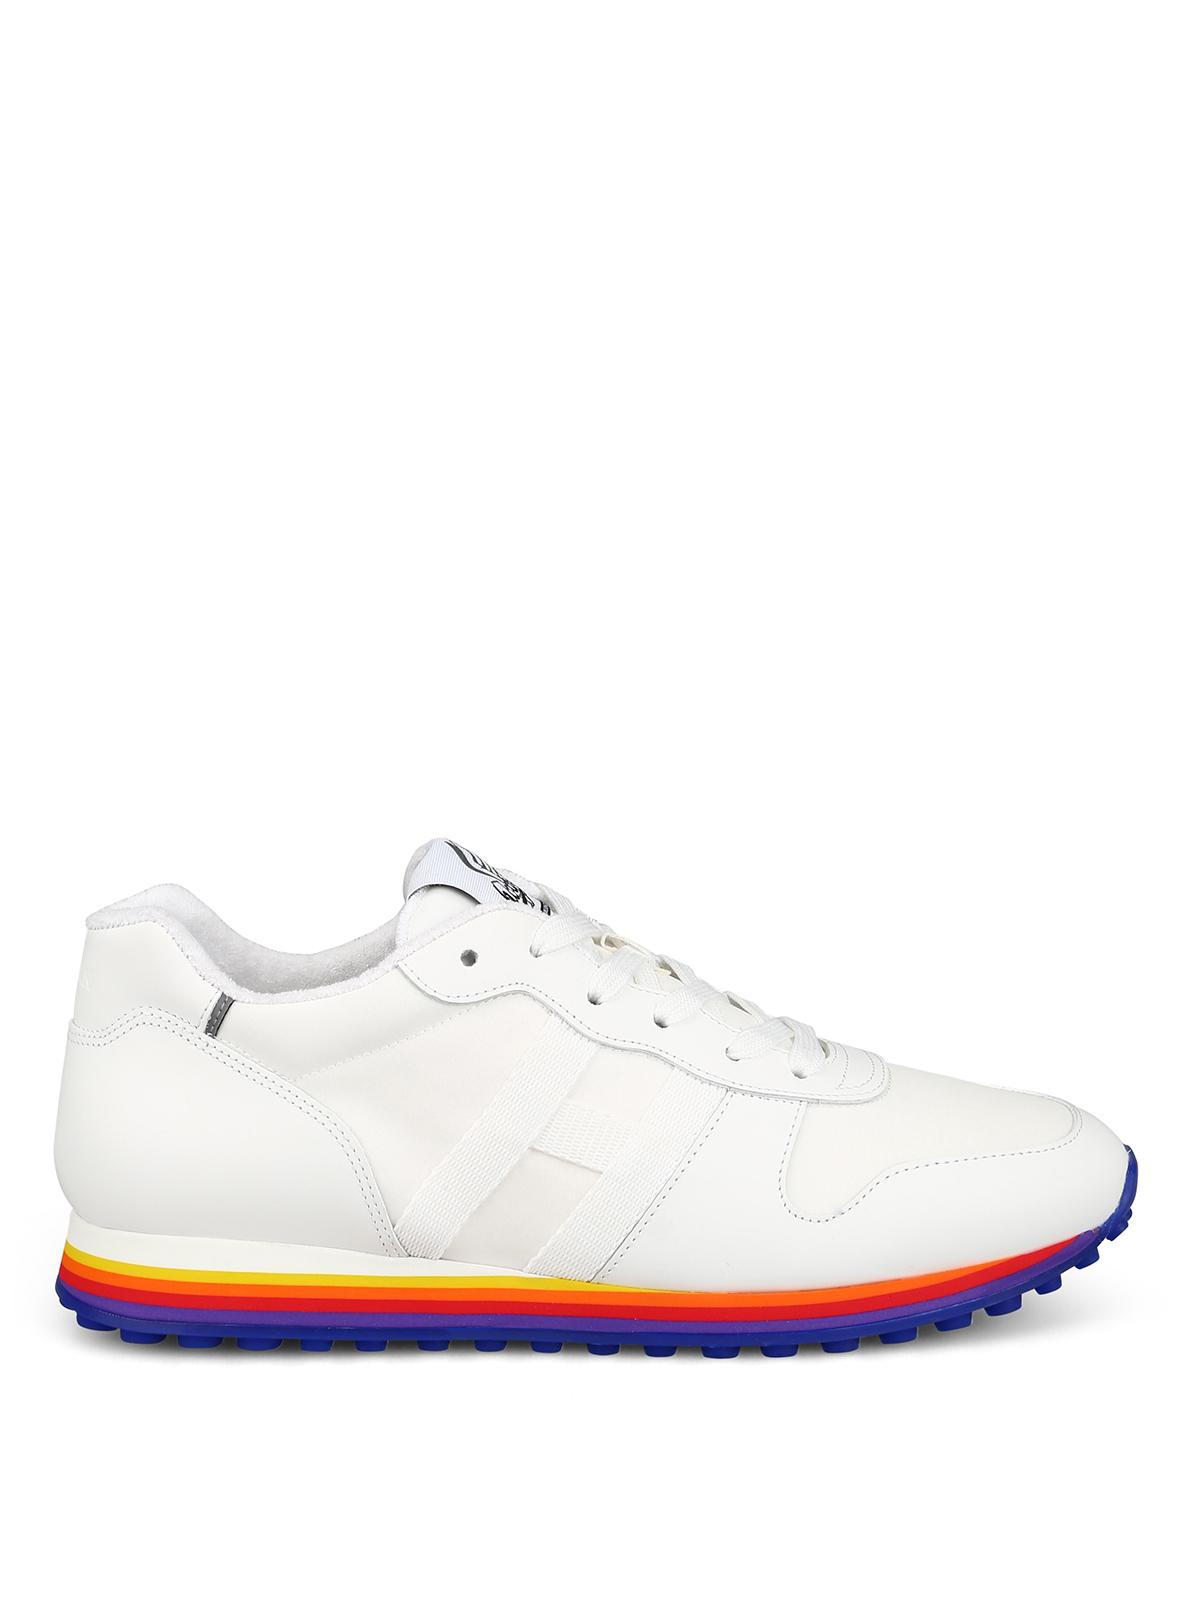 Sneakers Hogan - Sneaker stringate con suola arcobaleno ...